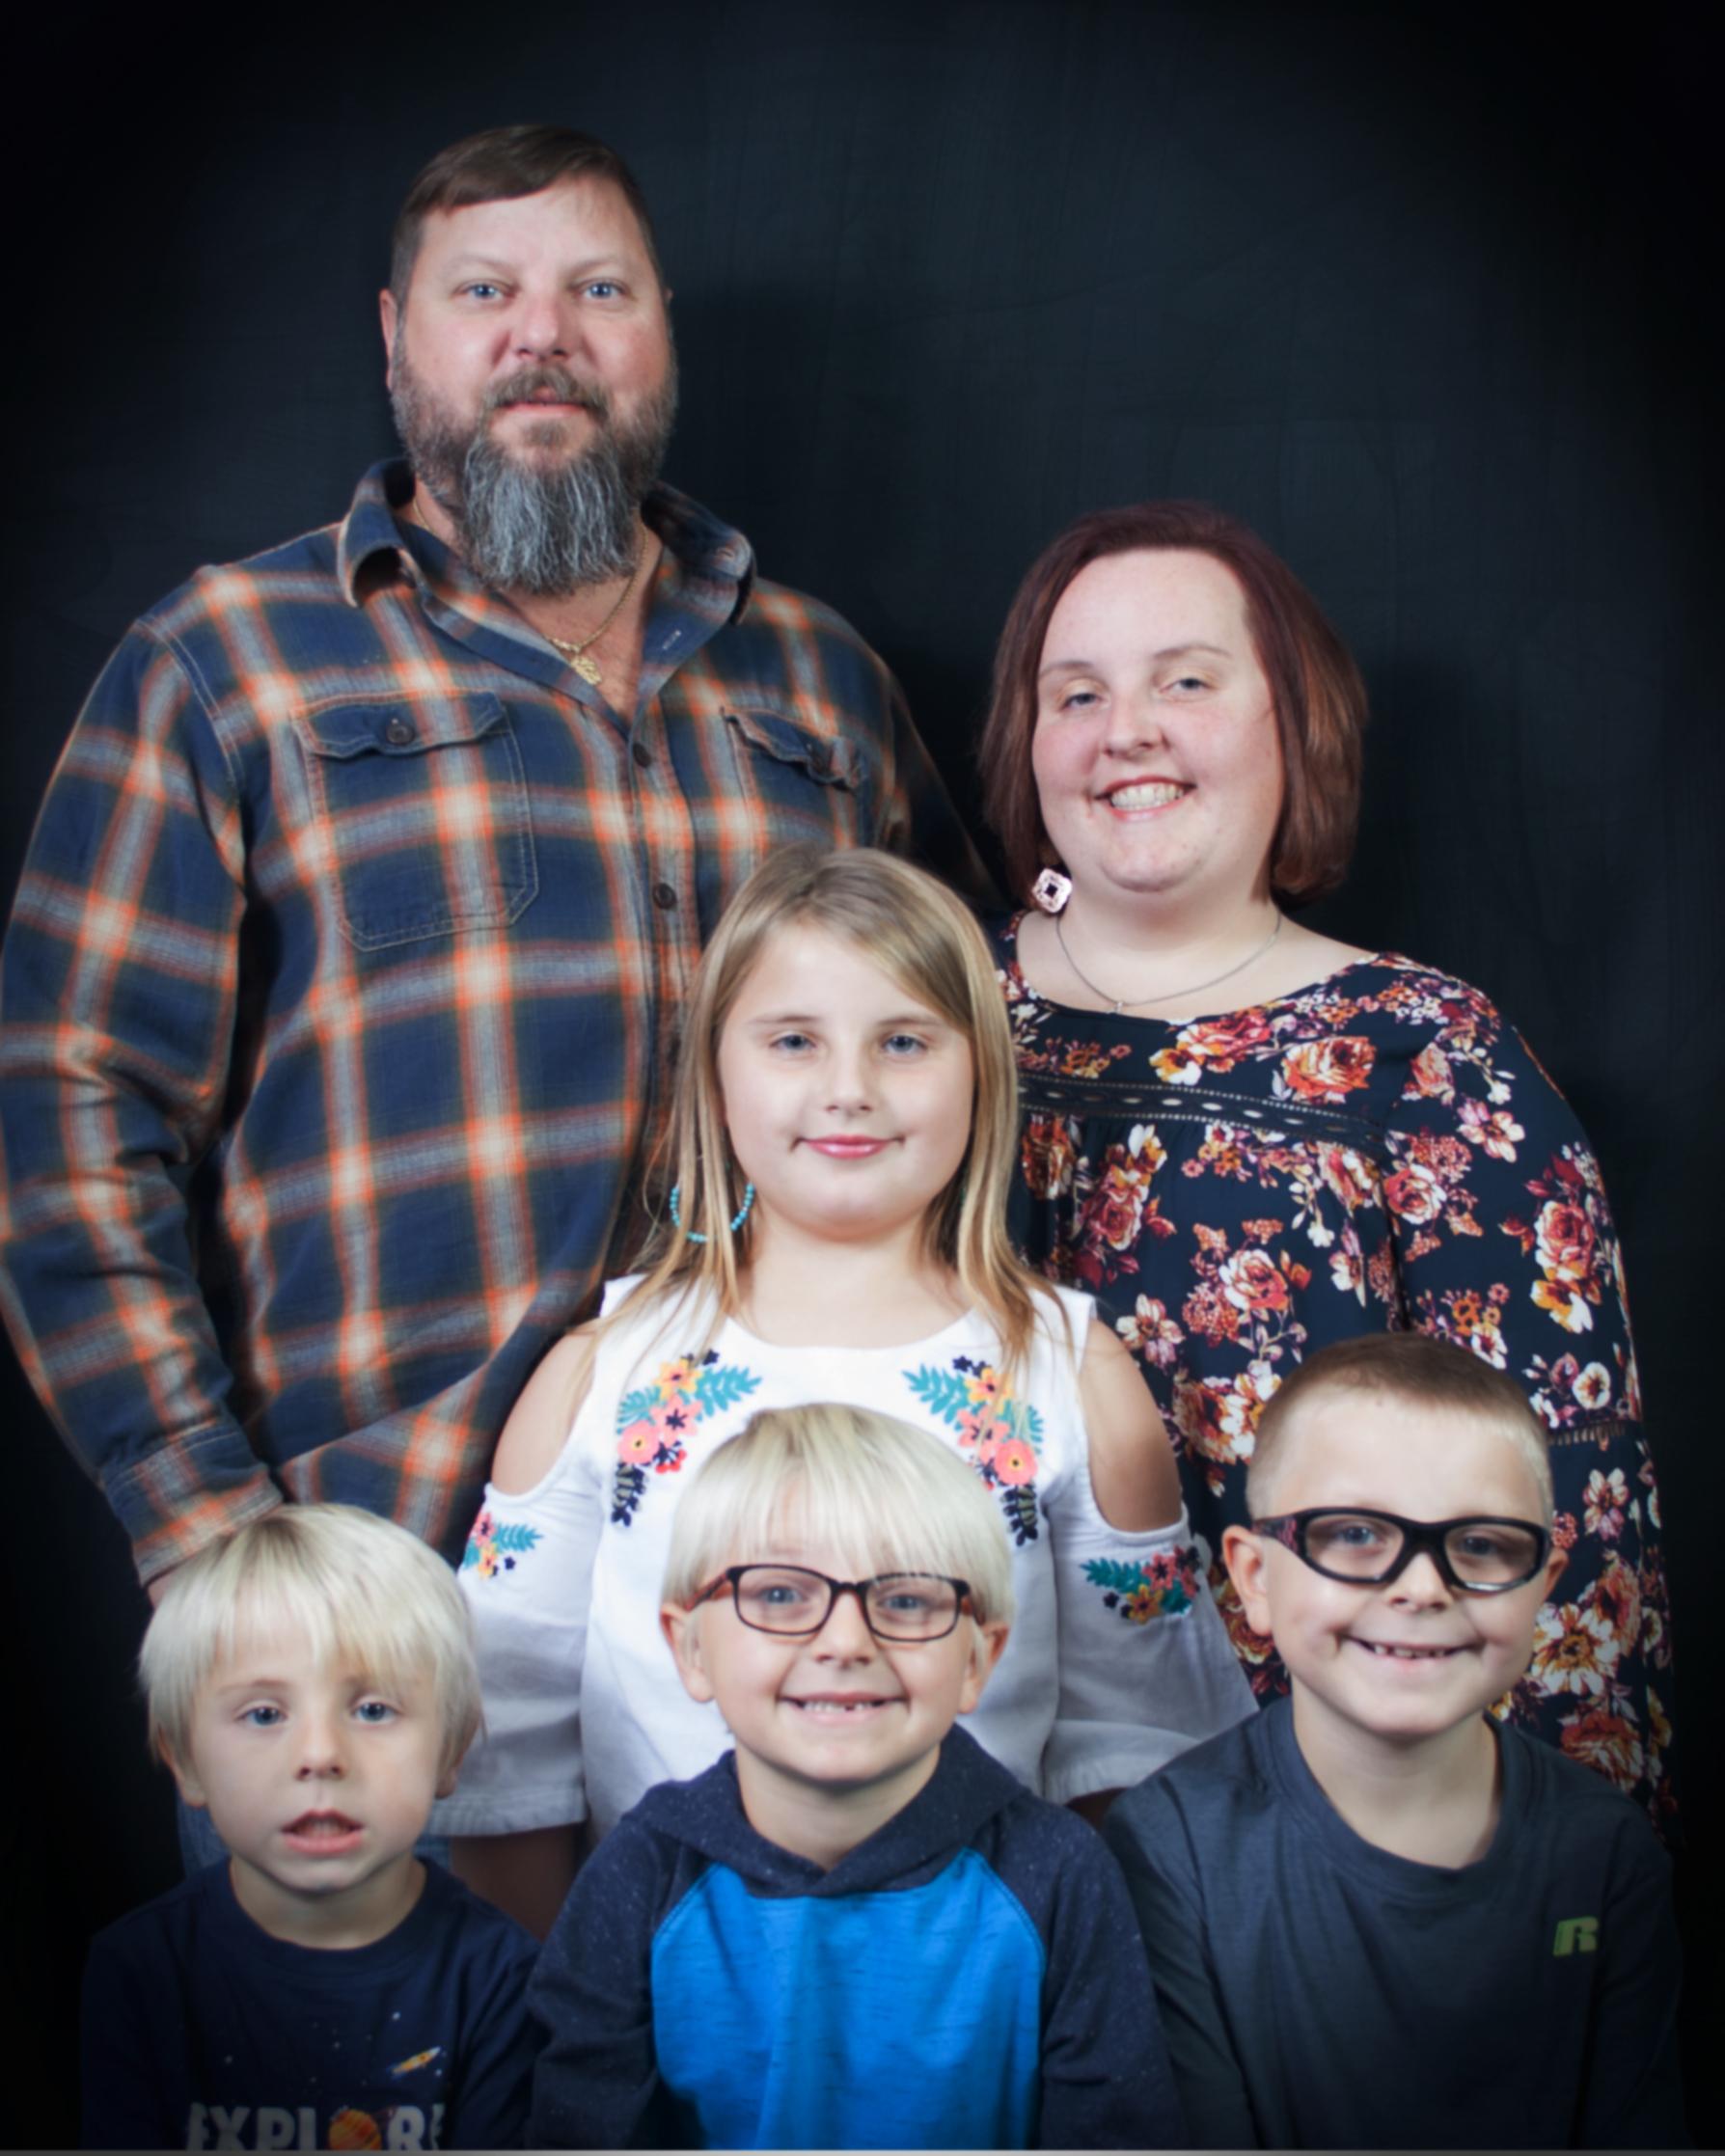 Ray, Nic, Desirea and family